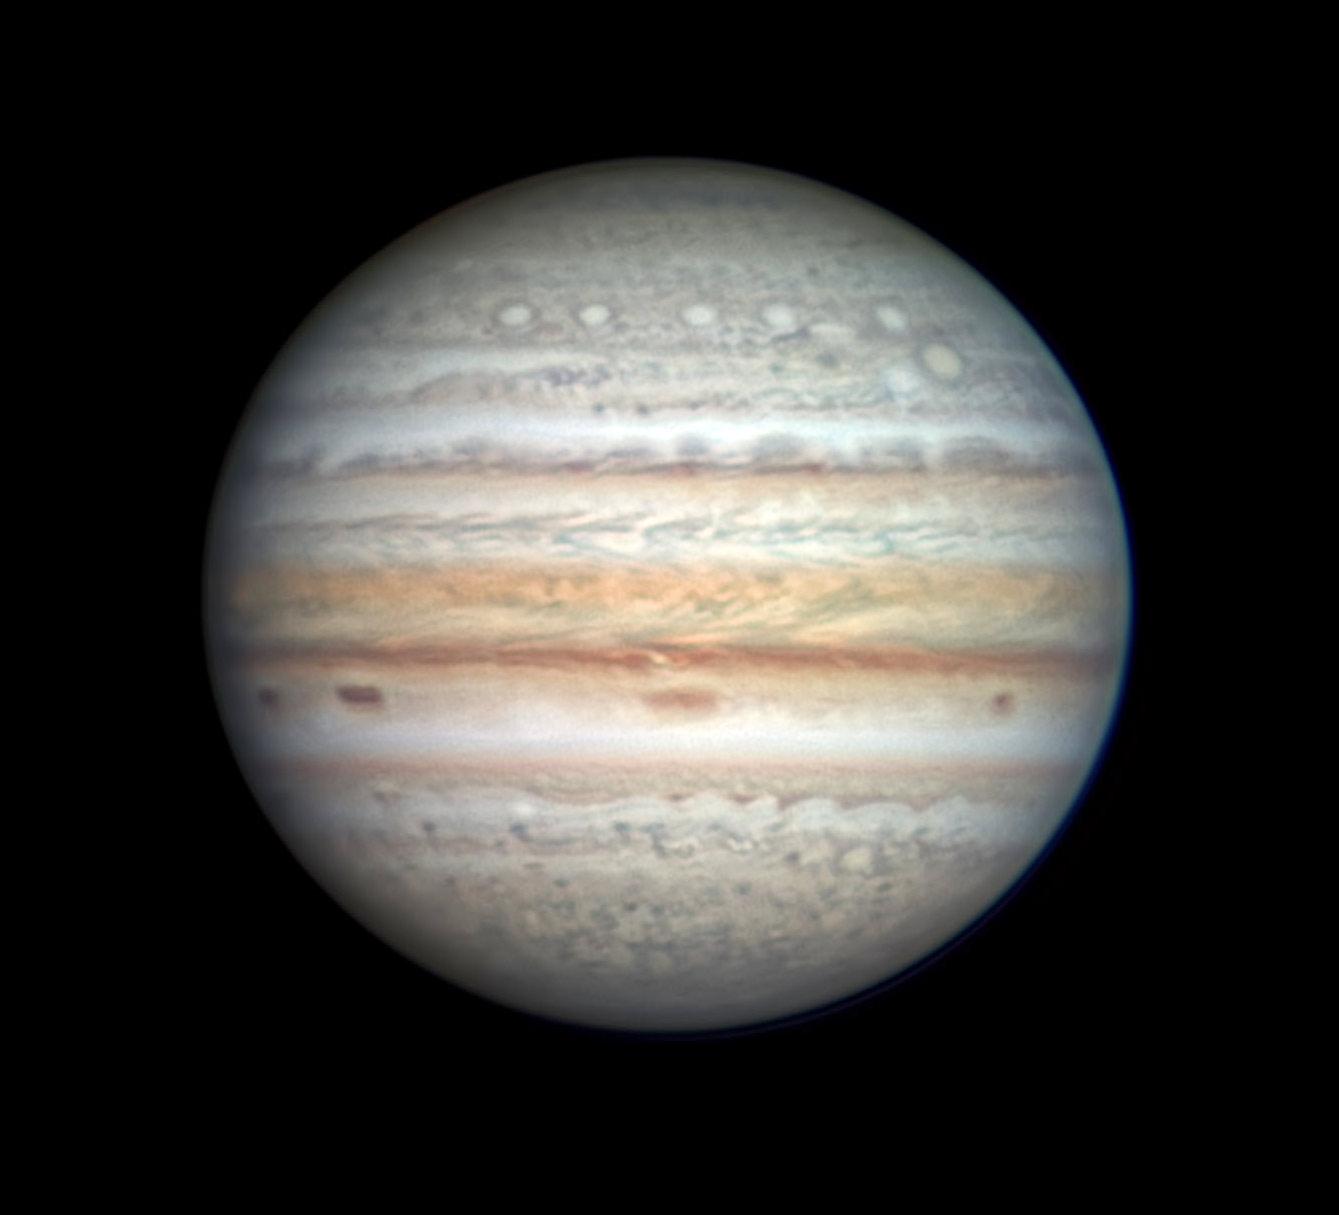 Jupiter on July 12, 2021